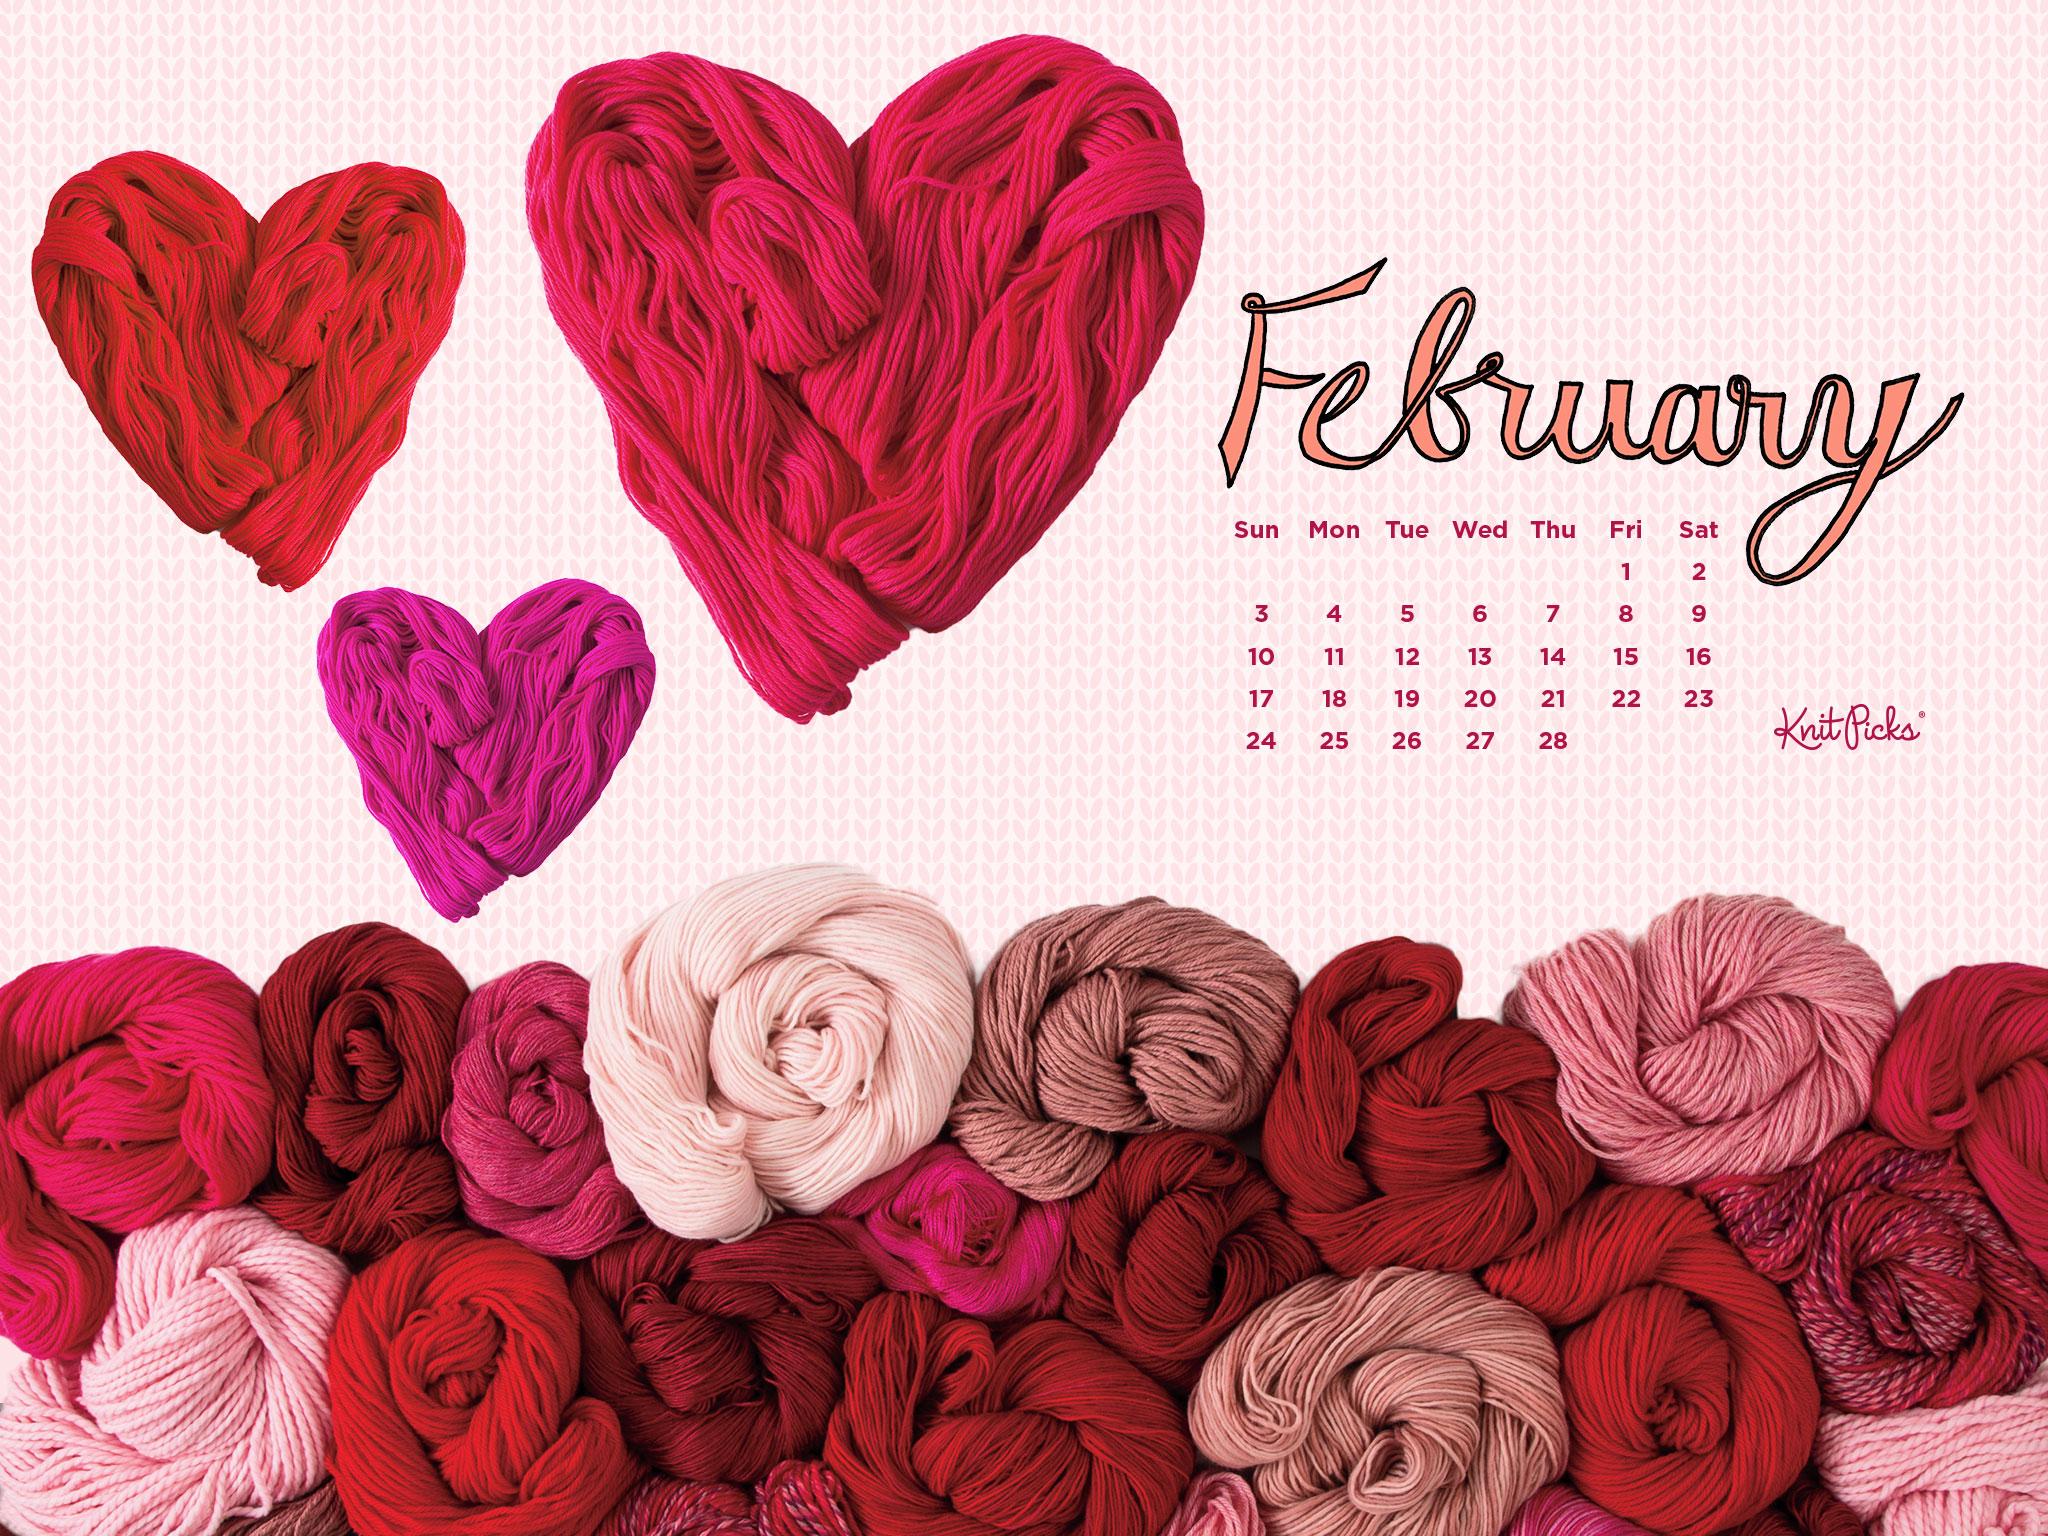 Downloadable February 2019 Calendar   KnitPicks Staff 2048x1536